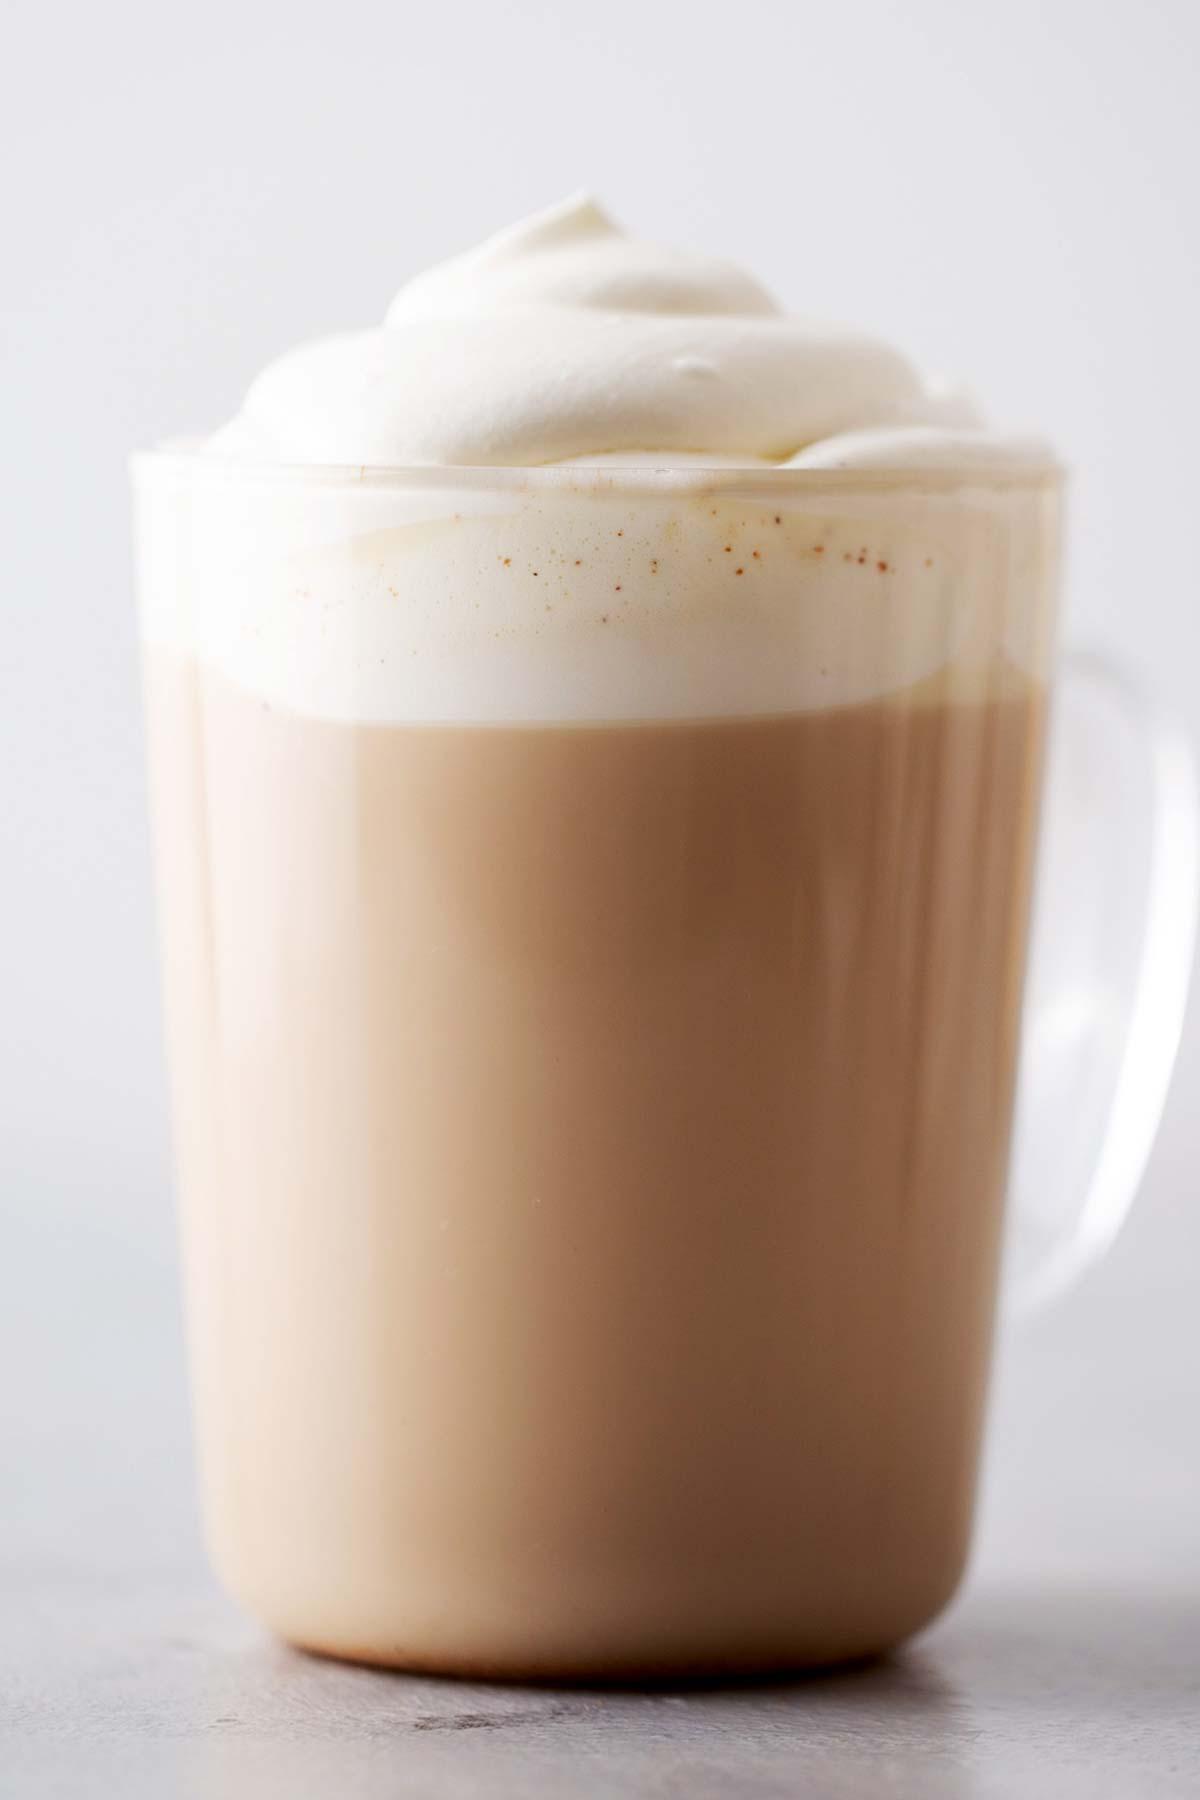 Starbucks Pumpkin Spice Latte copycat drink with whipped cream.